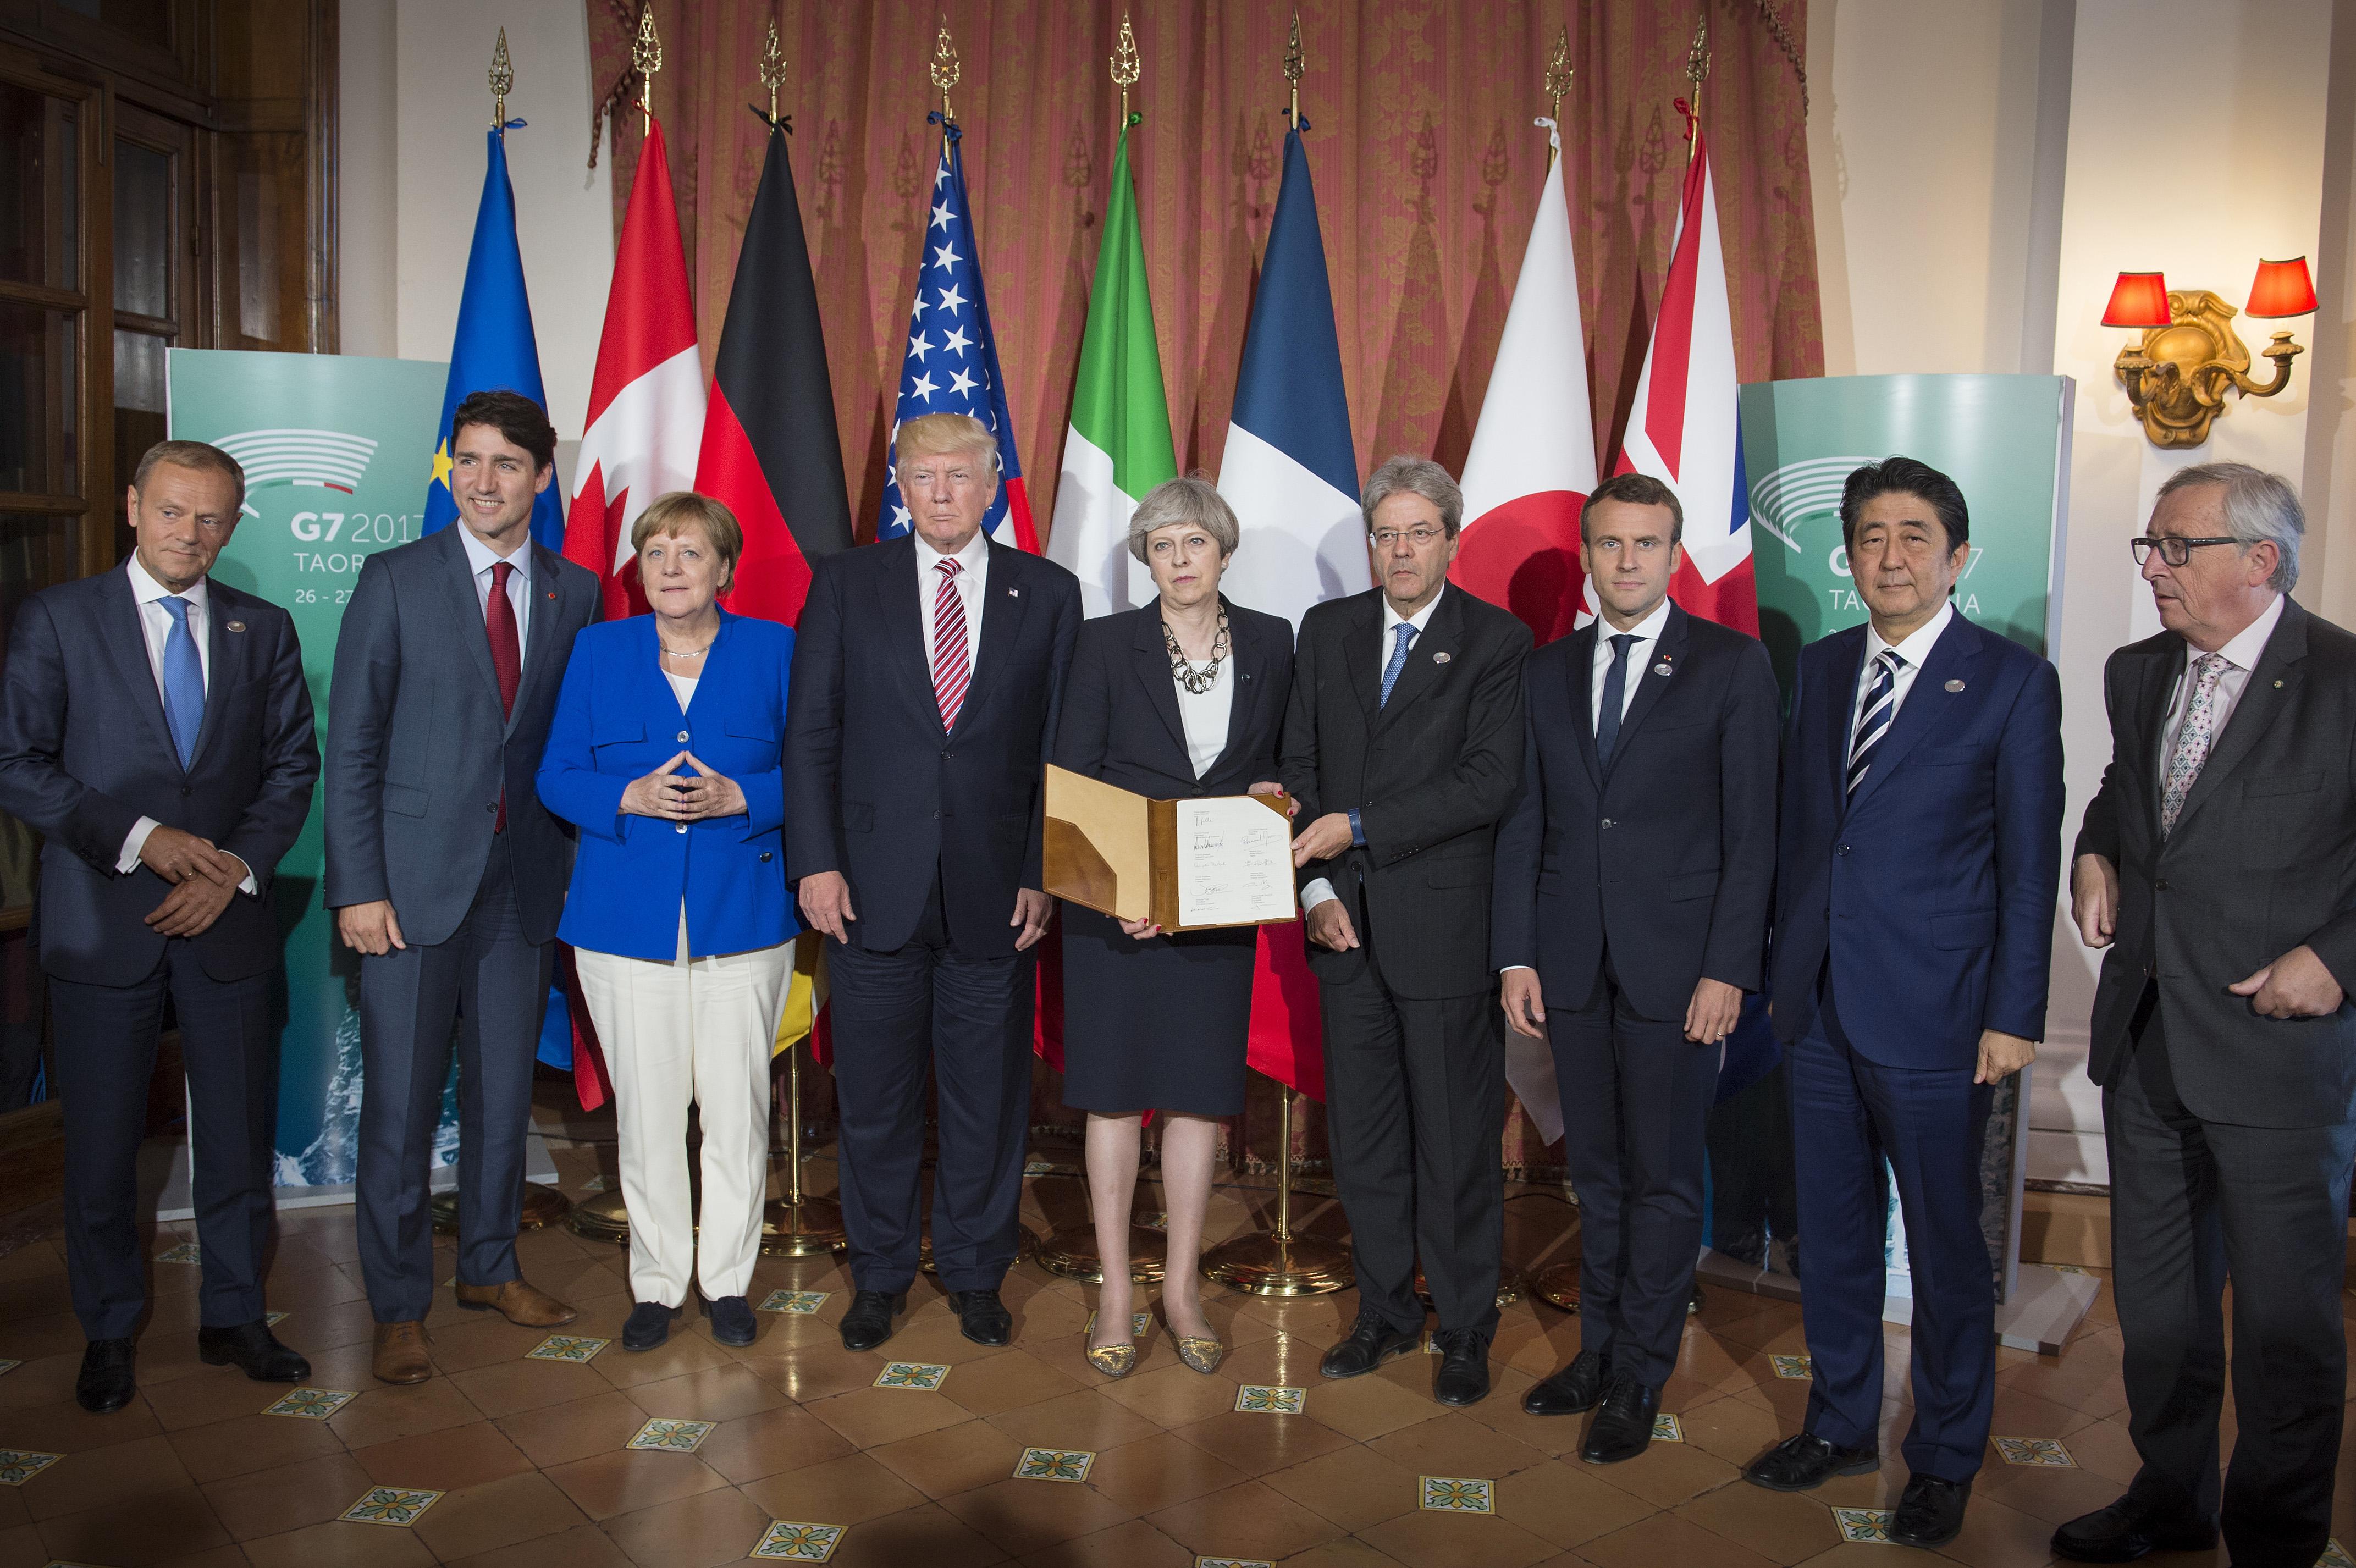 World leaders photo